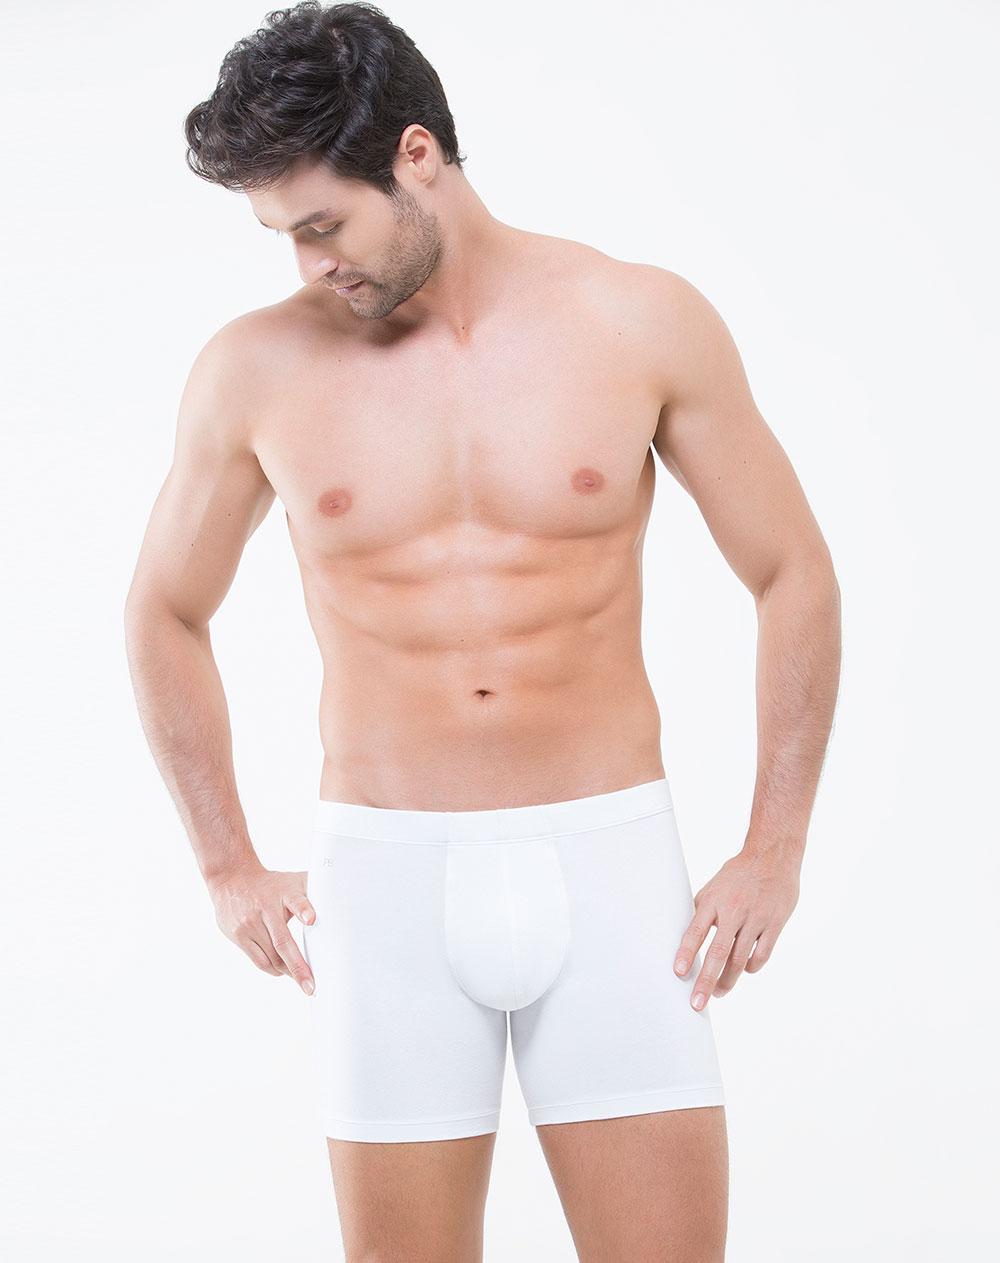 B xer de hombre orenburgo blanco en algod n punto blanco for Ropa interior punto blanco